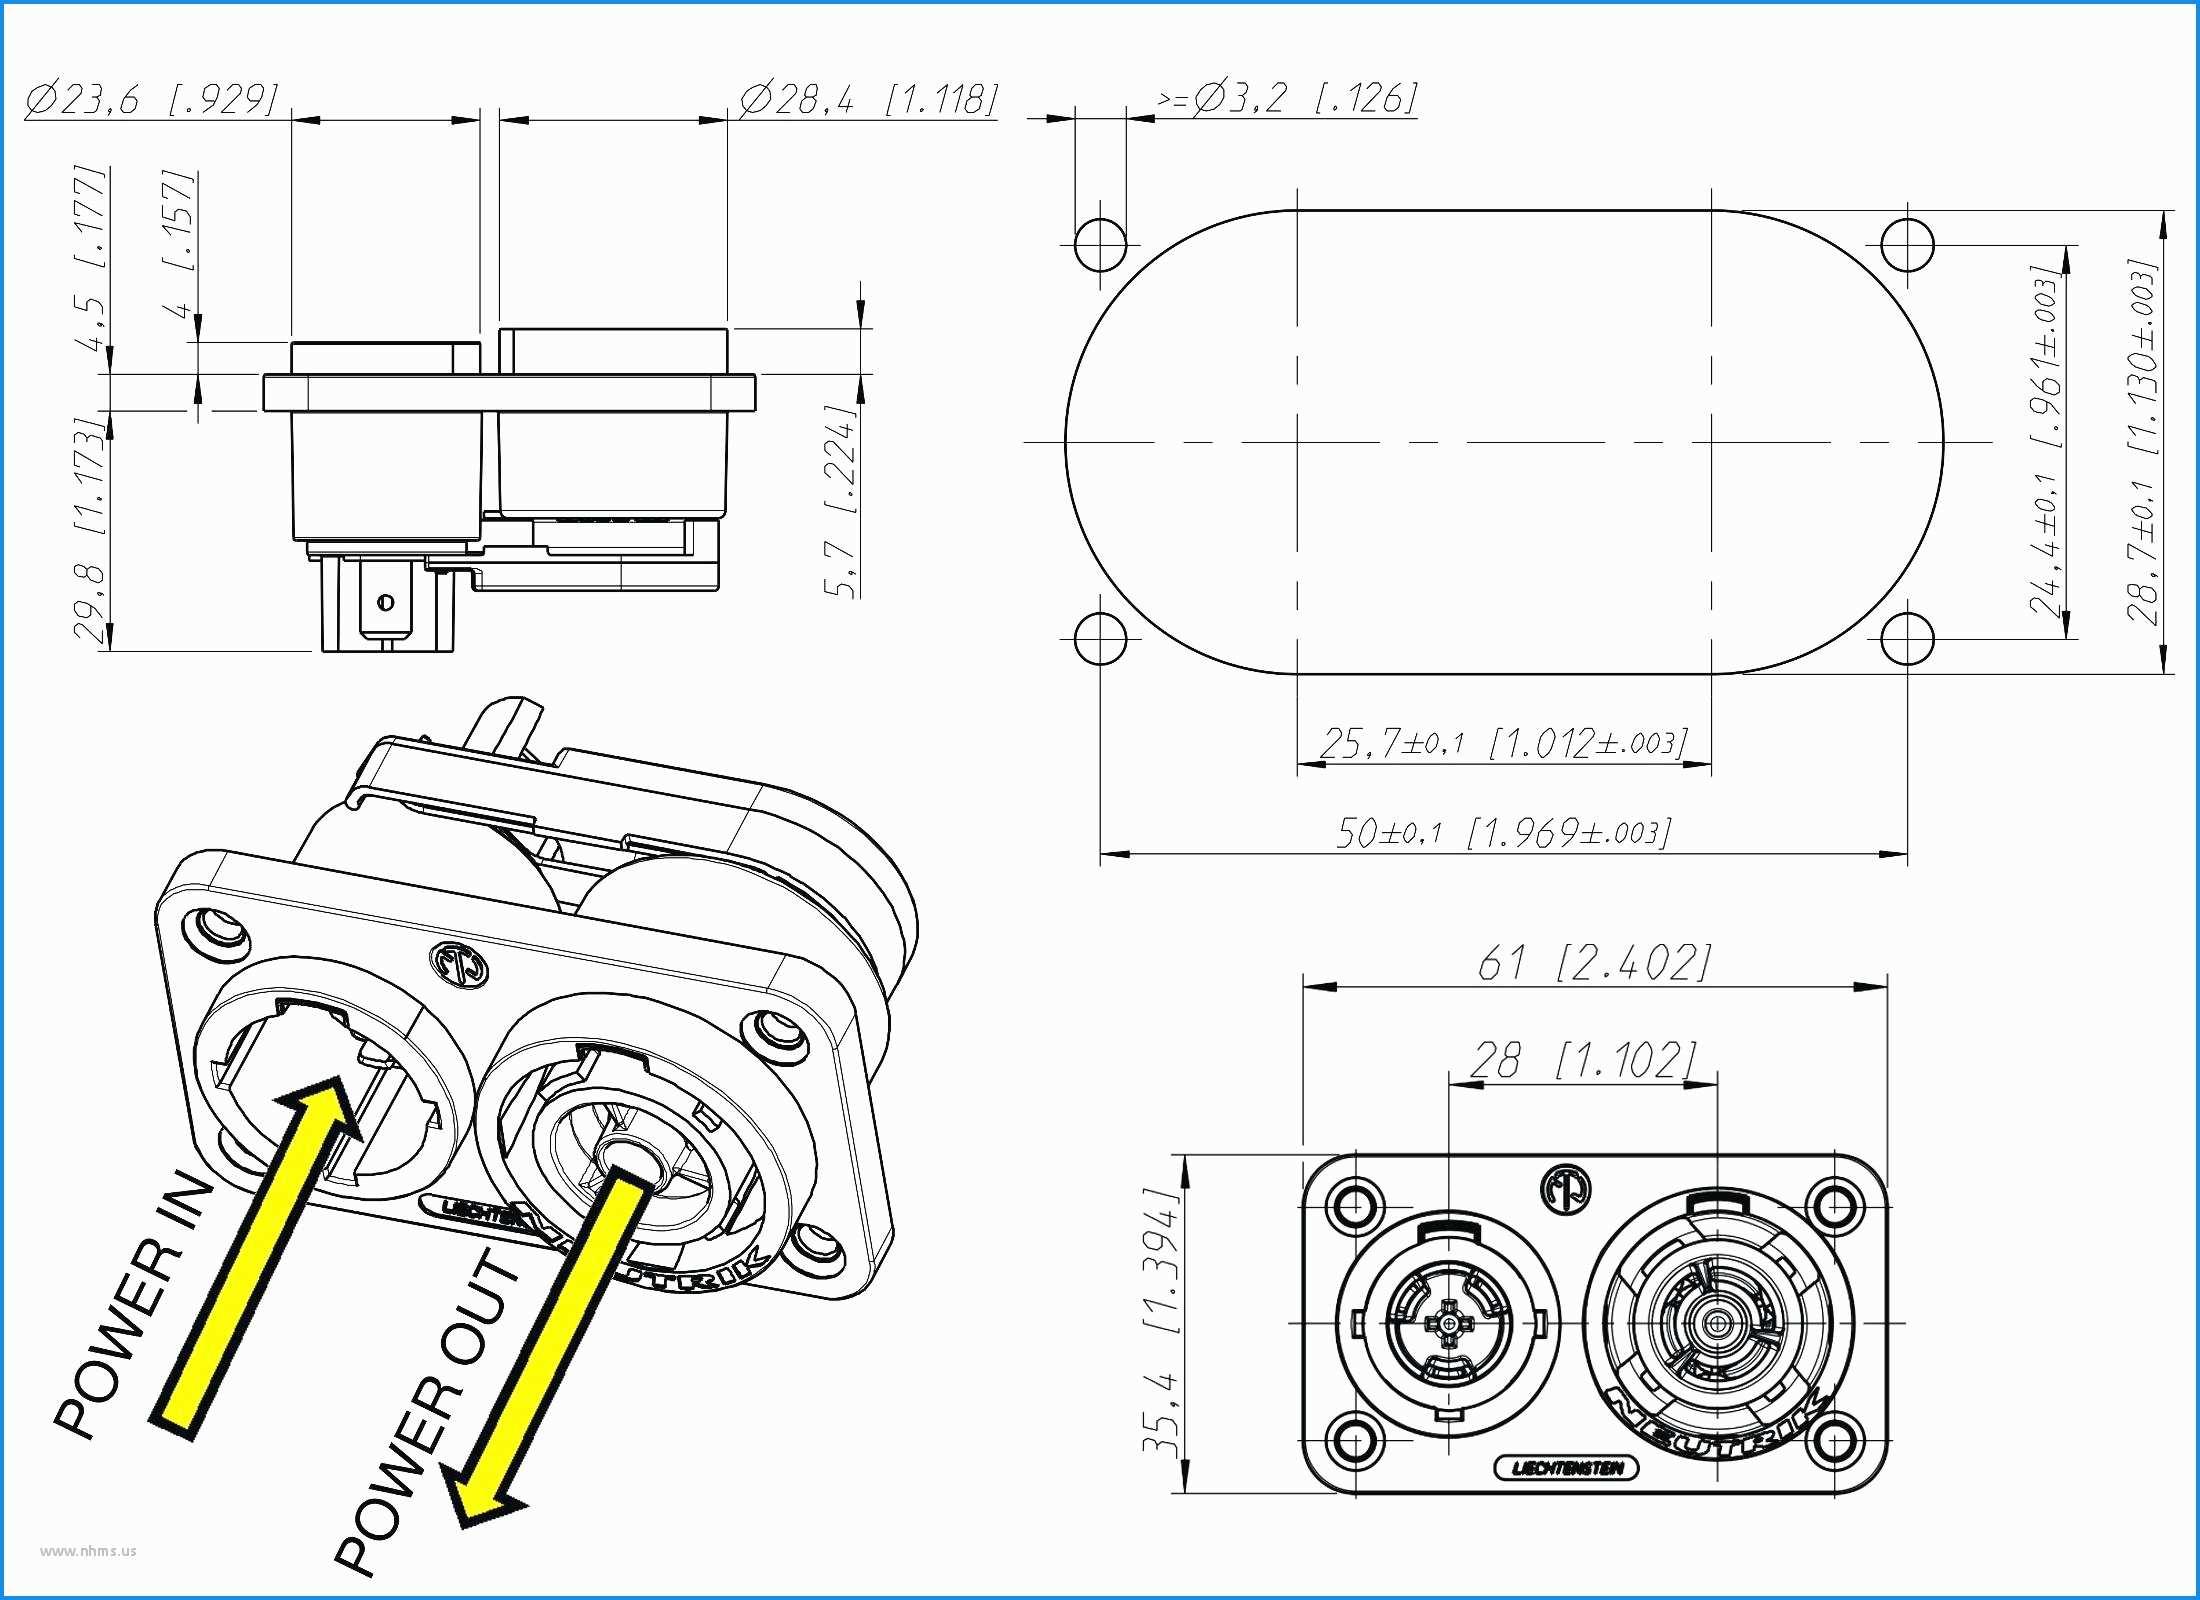 Wiring Diagram Software Open Source Uncomplicated Neutrik Speakon - Wiring Diagram Software Open Source